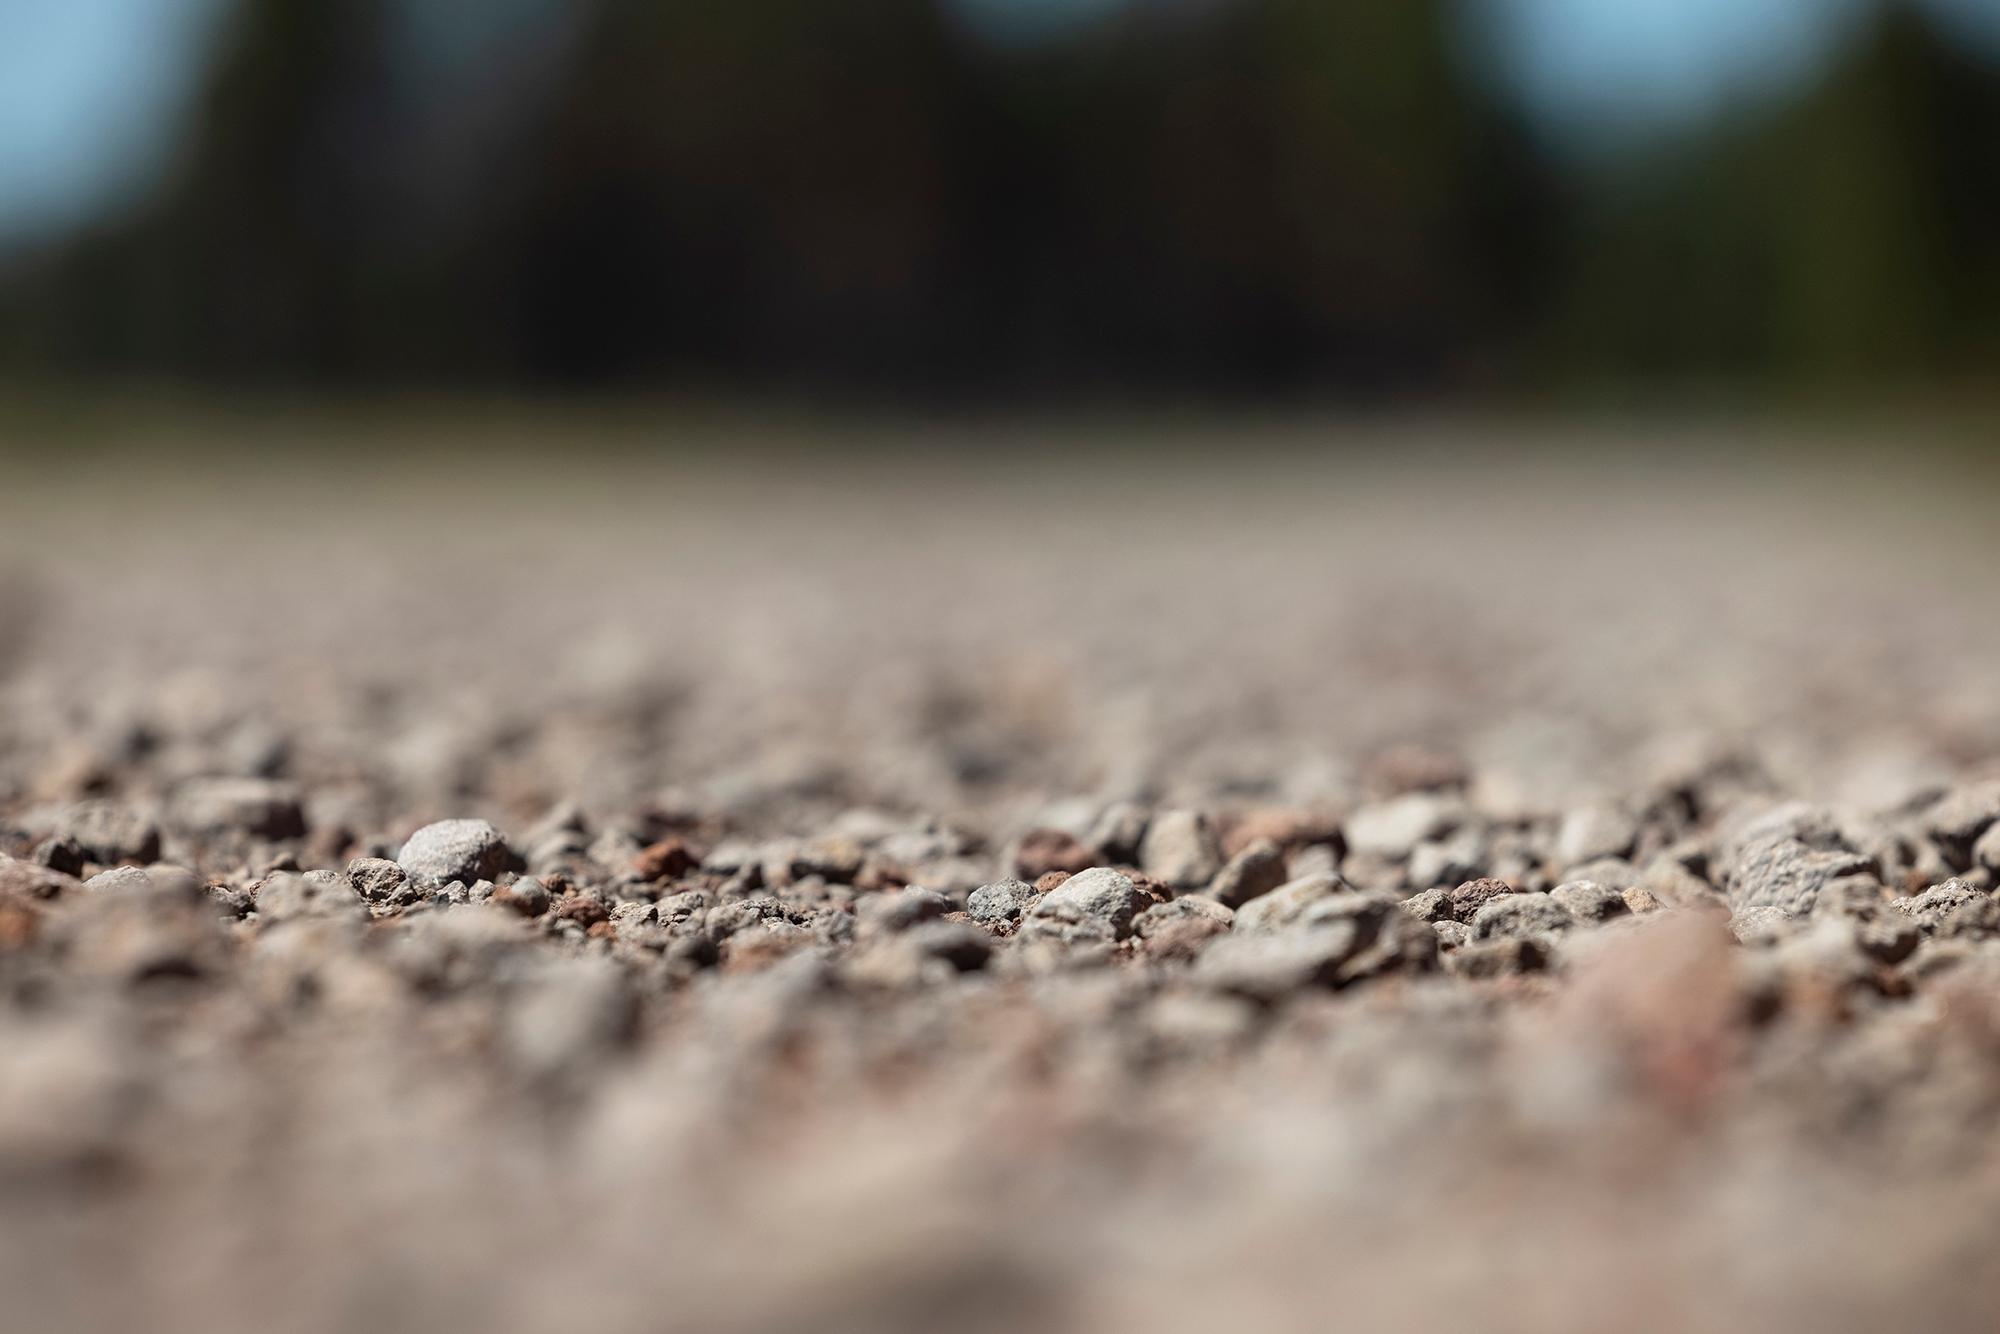 Loose gravel. (Rugile Kaladyte)